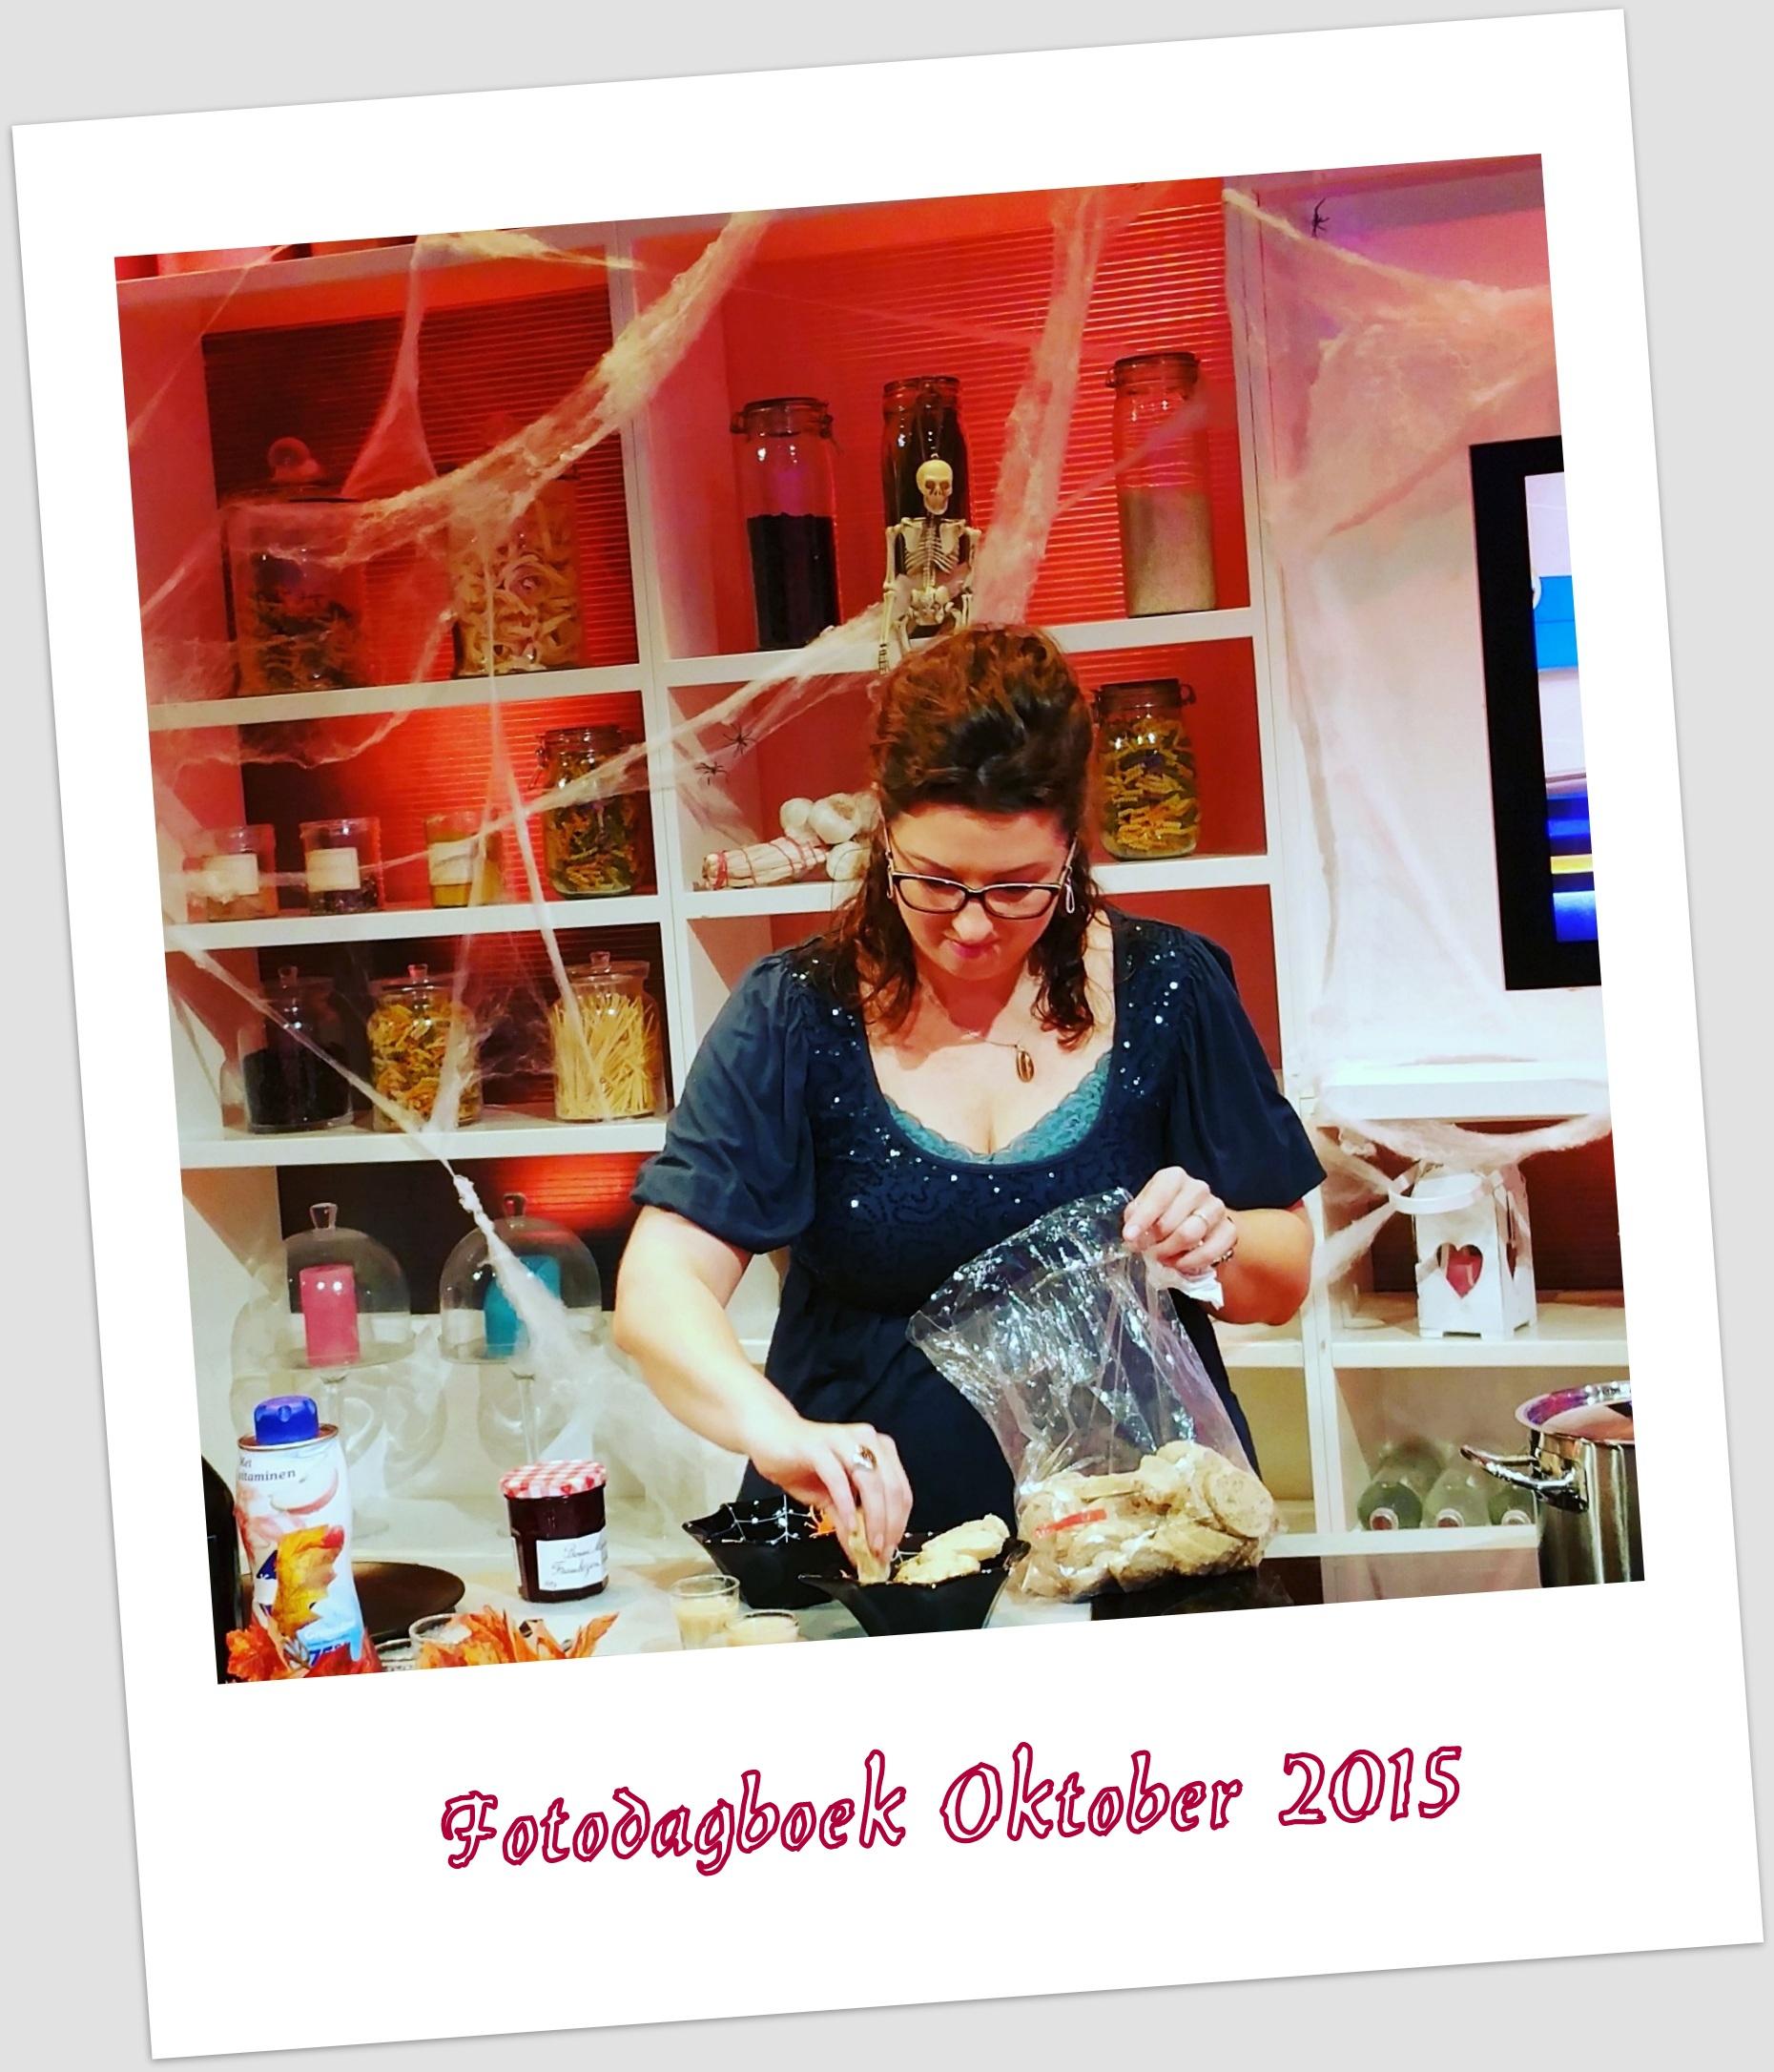 Fotodagboek Oktober 2015